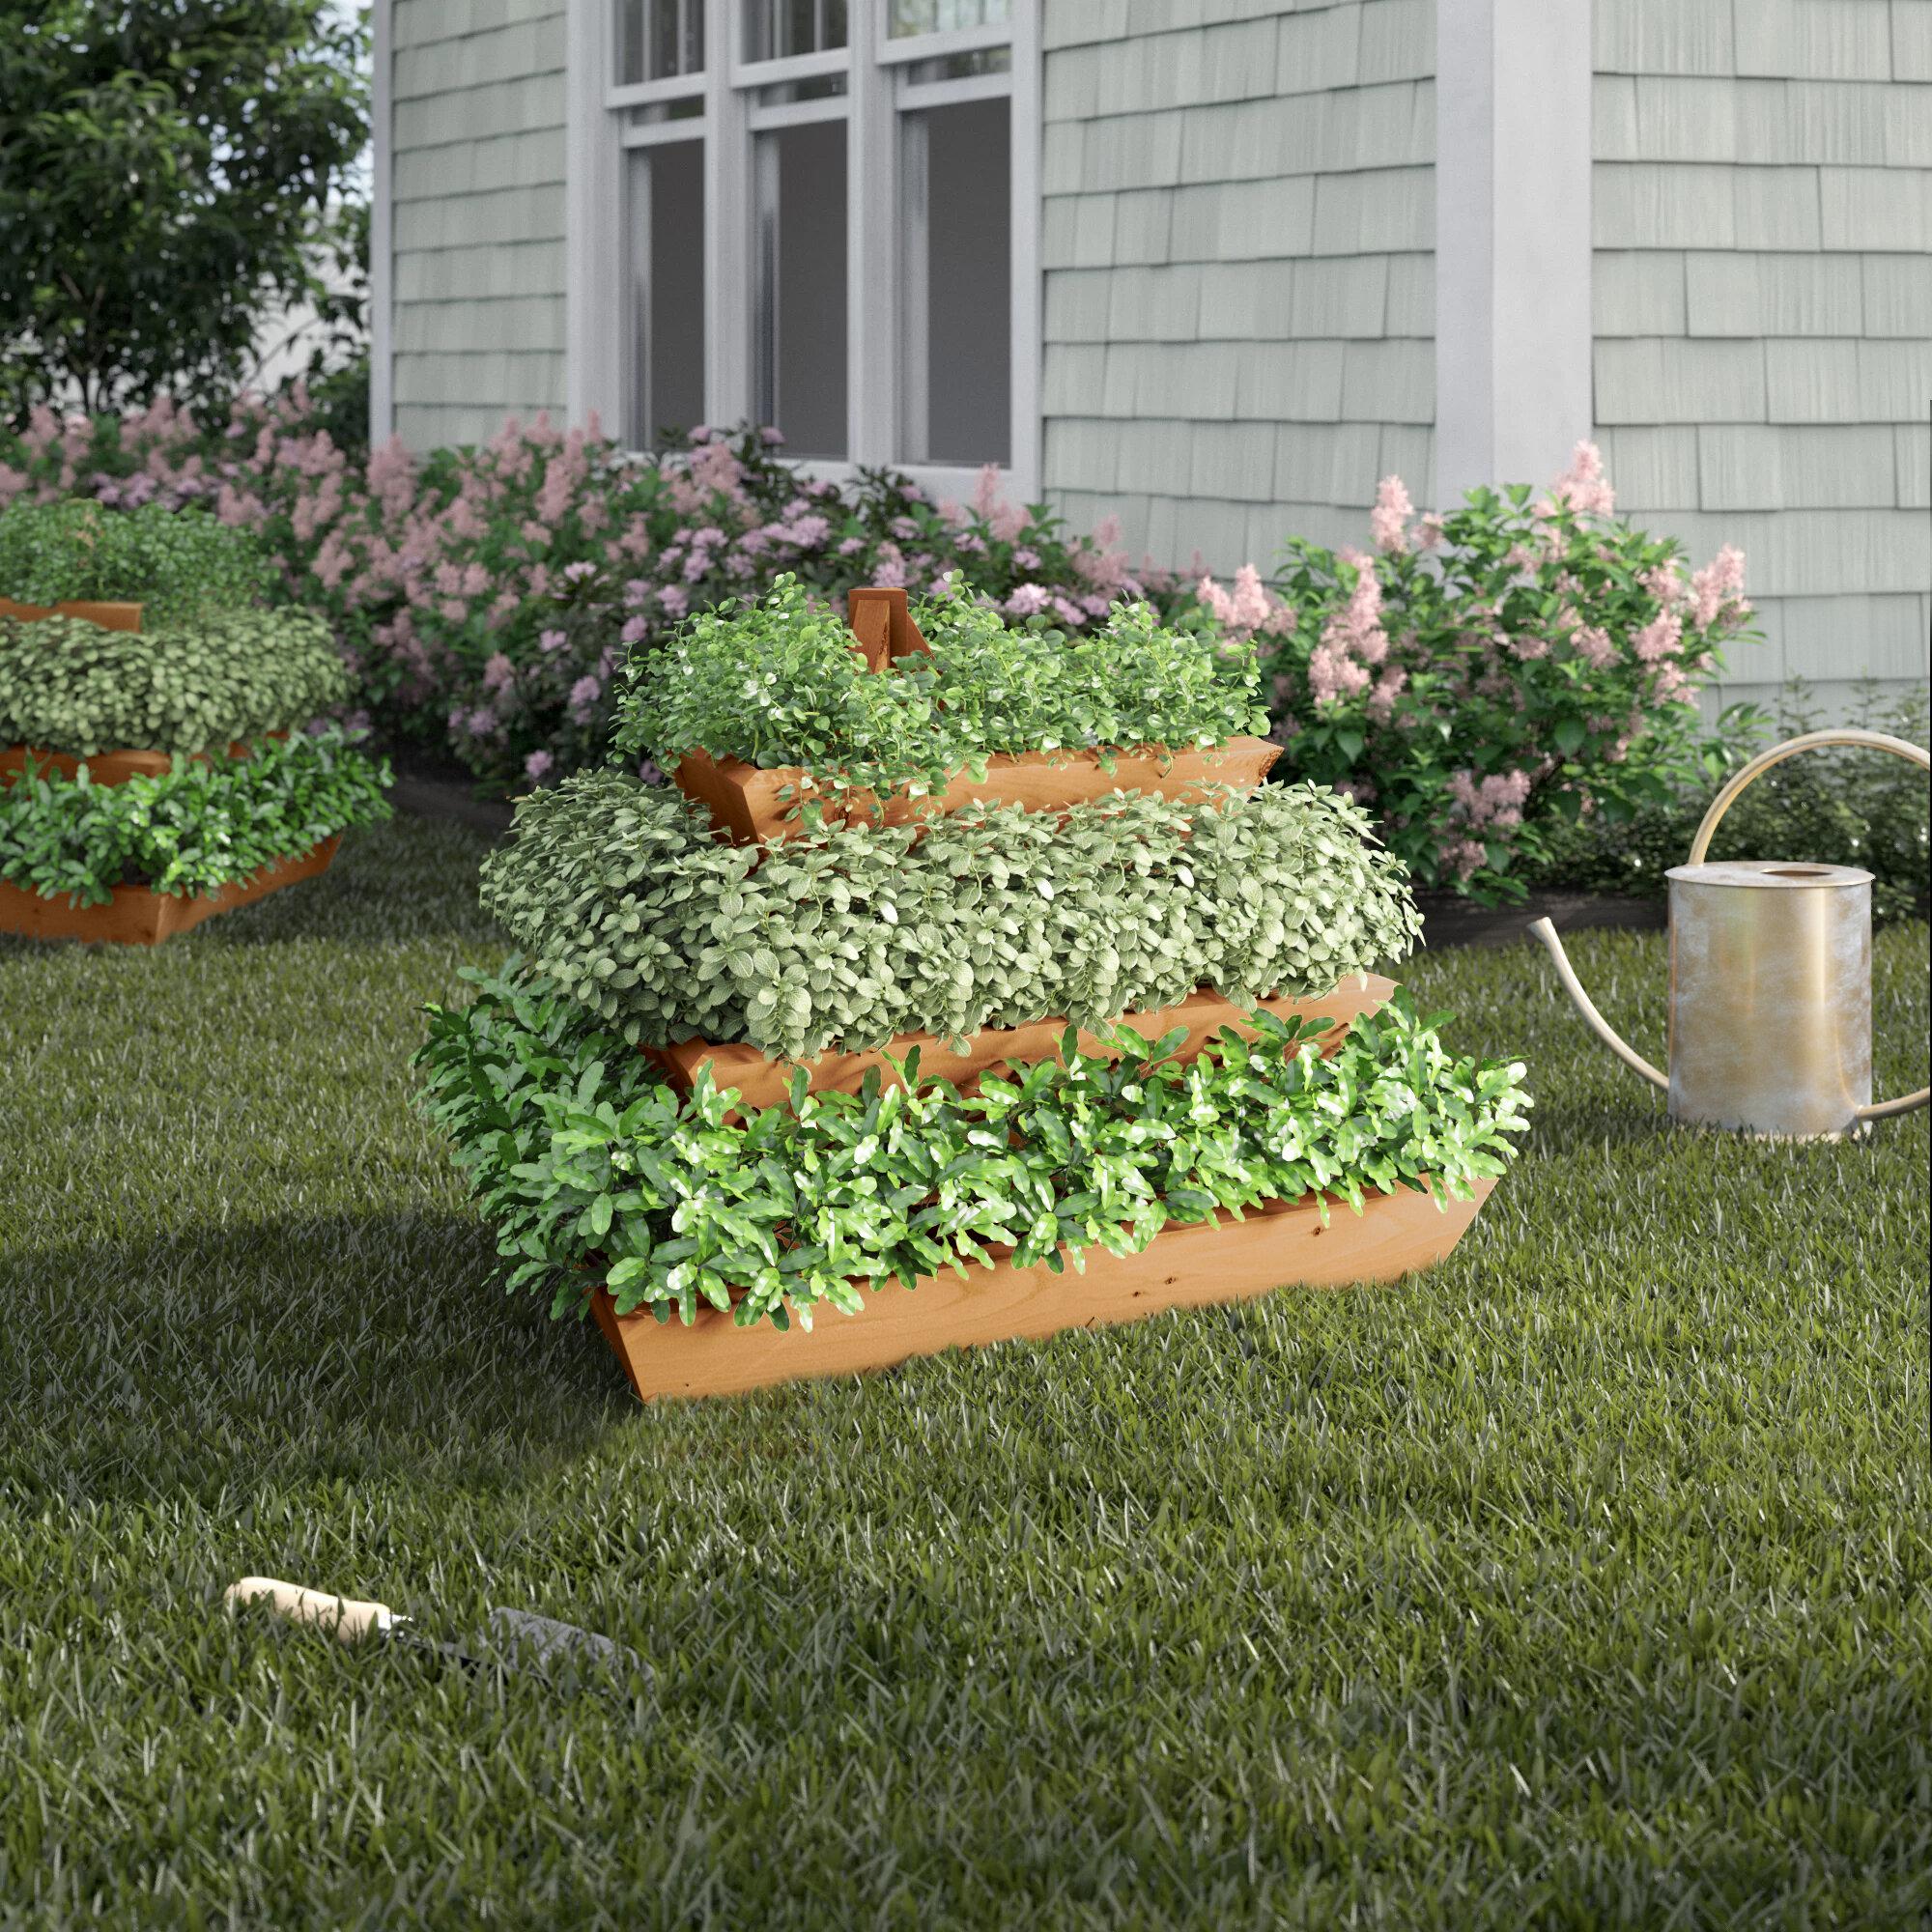 Tremendous Adaline 3 Ft X 3 Ft Western Red Cedar Vertical Garden Short Links Chair Design For Home Short Linksinfo